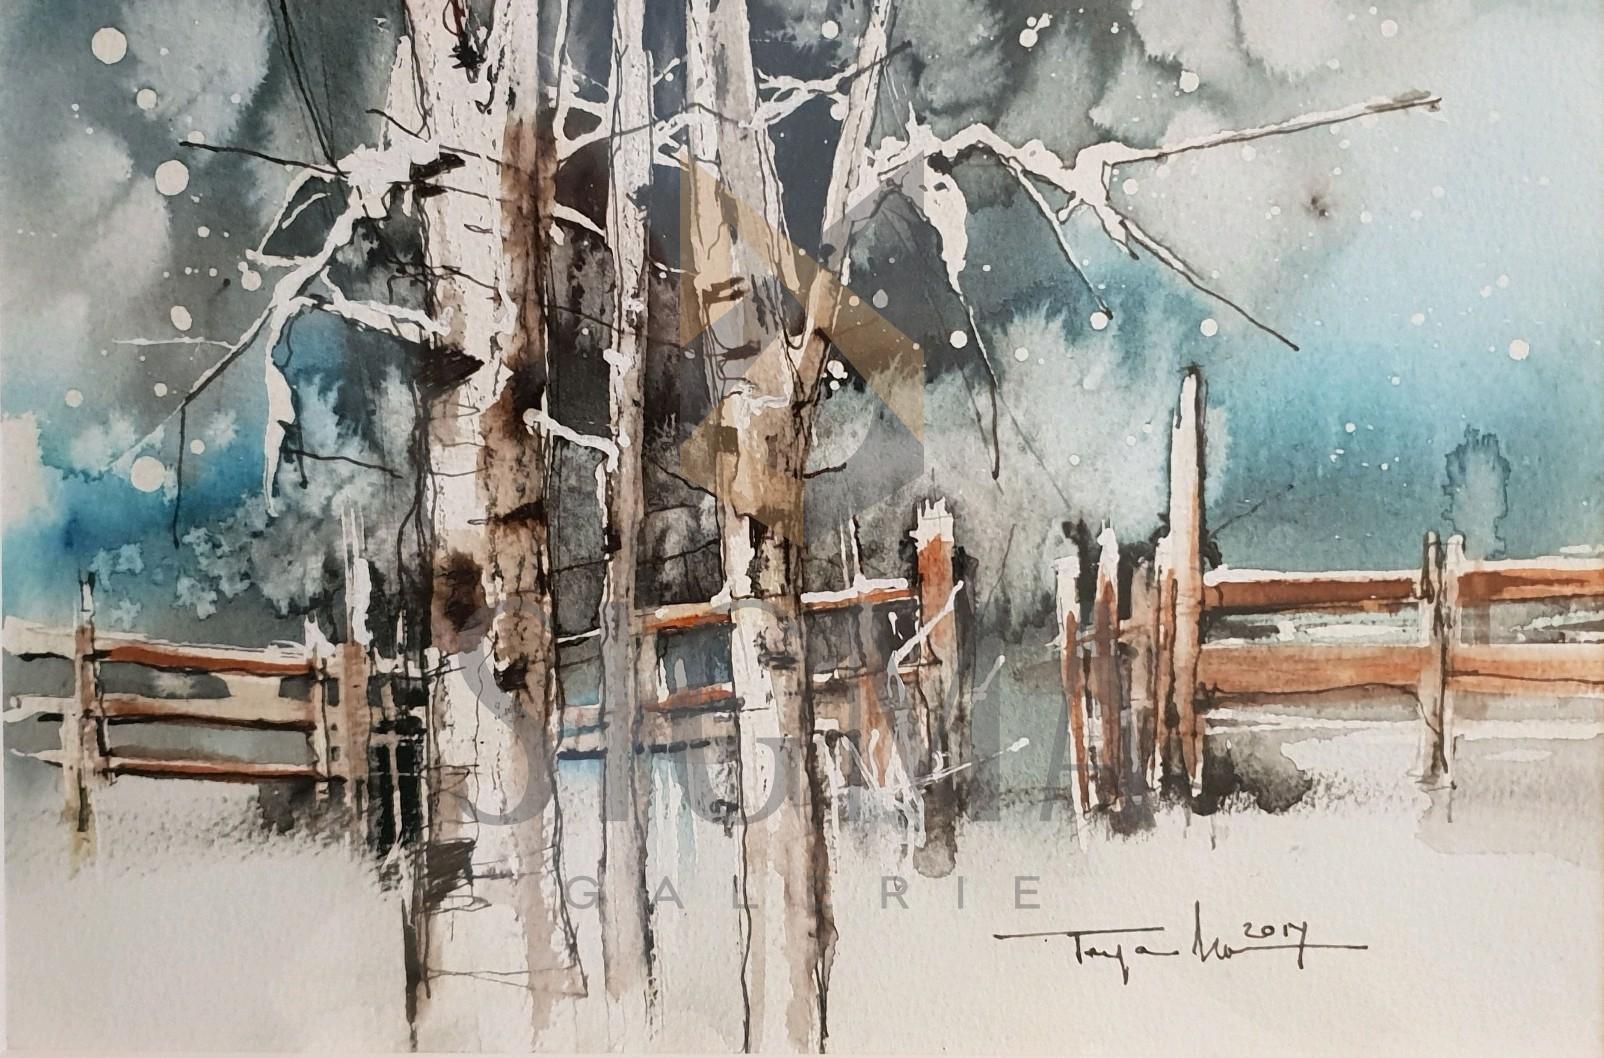 "Tablou, Autor: Mugur Popa, "" Peisaj de iarnai "", datat 2018,  acuarela si tus pe hartie canson,  Dim: 18 x 27 cm."